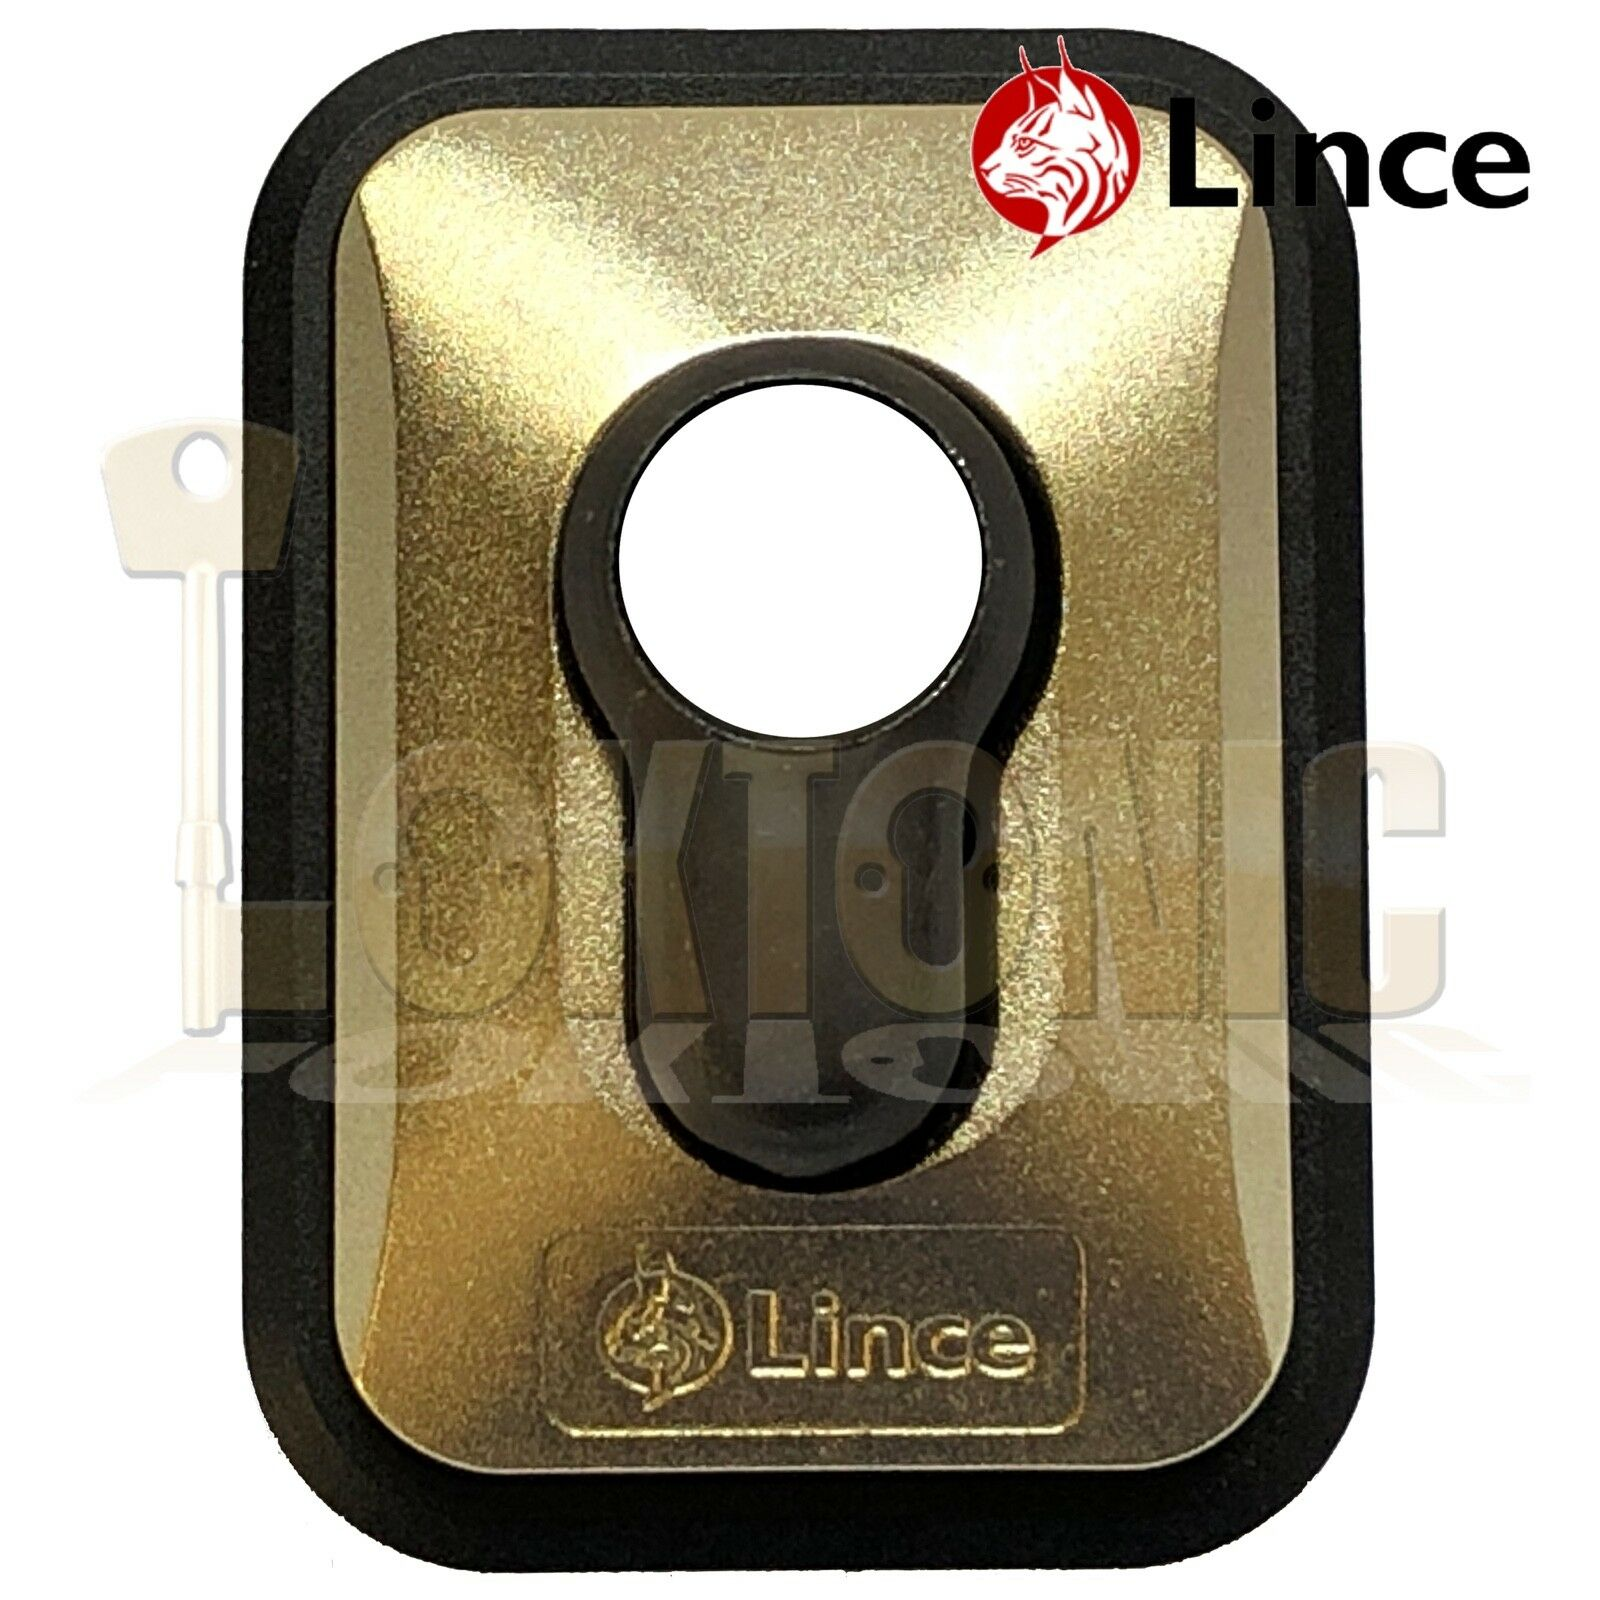 Lince Brass High Security Euro Cylinder Escutcheon Key